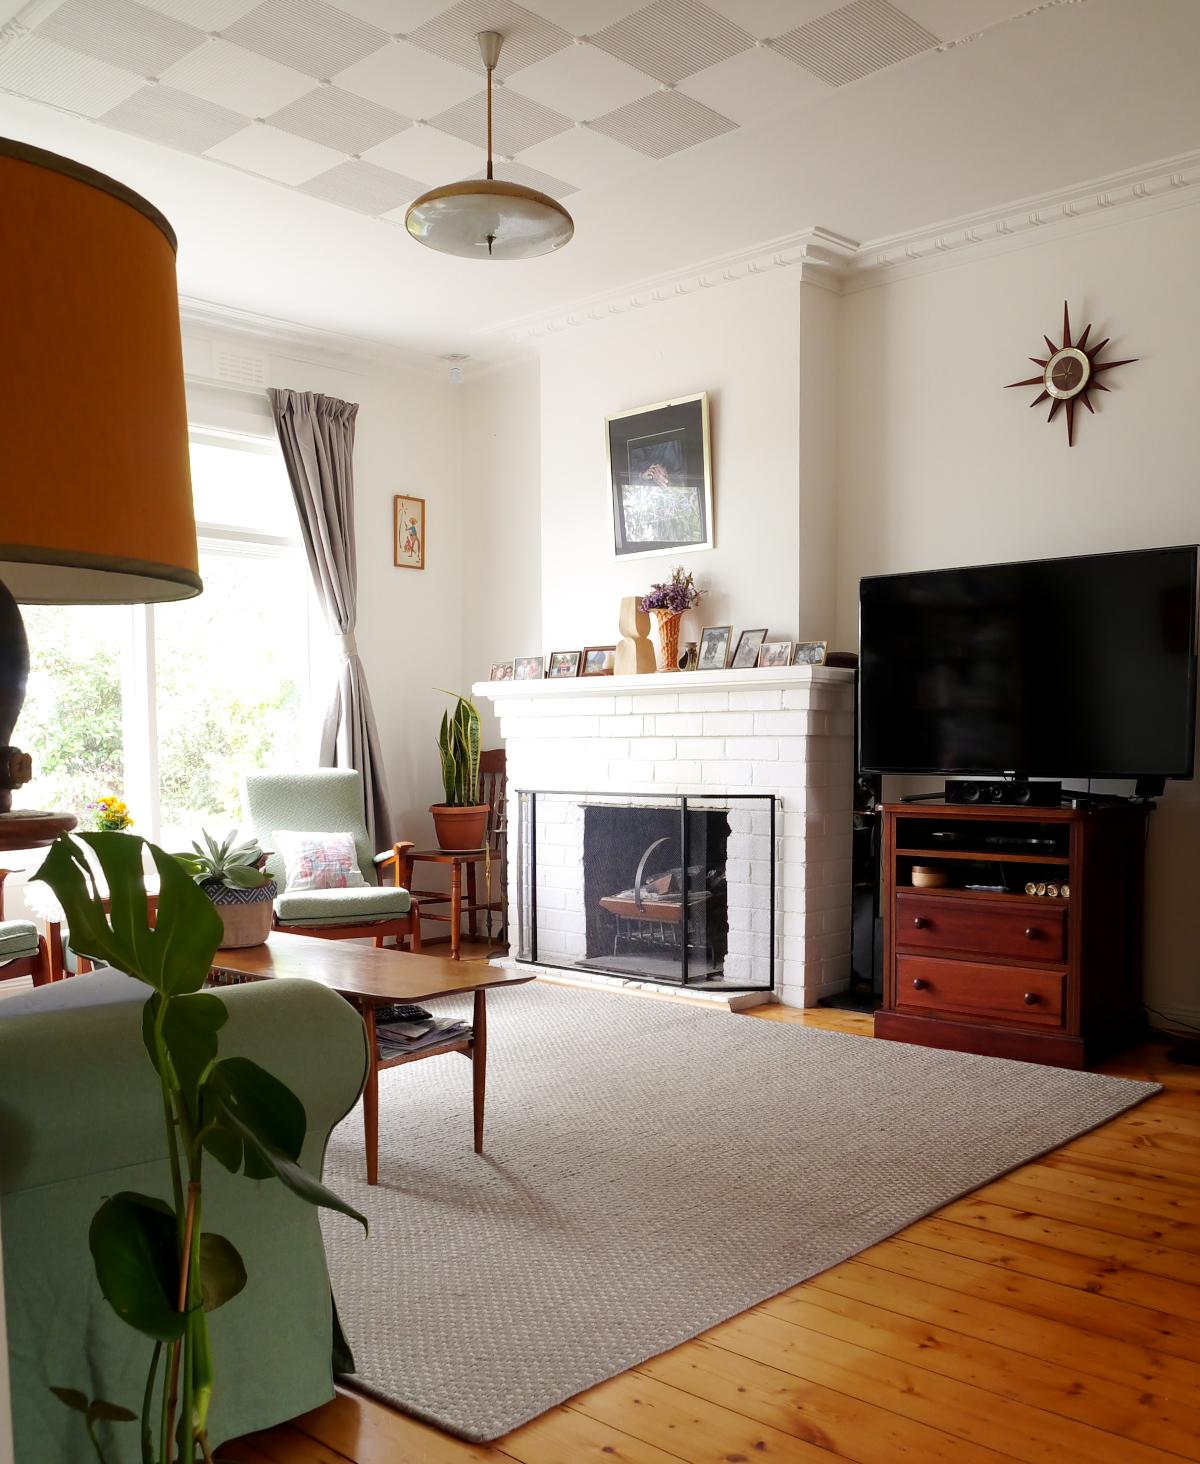 The Living Room Australia: Room 58 €� Carla's Living Room (Melbourne, Australia)